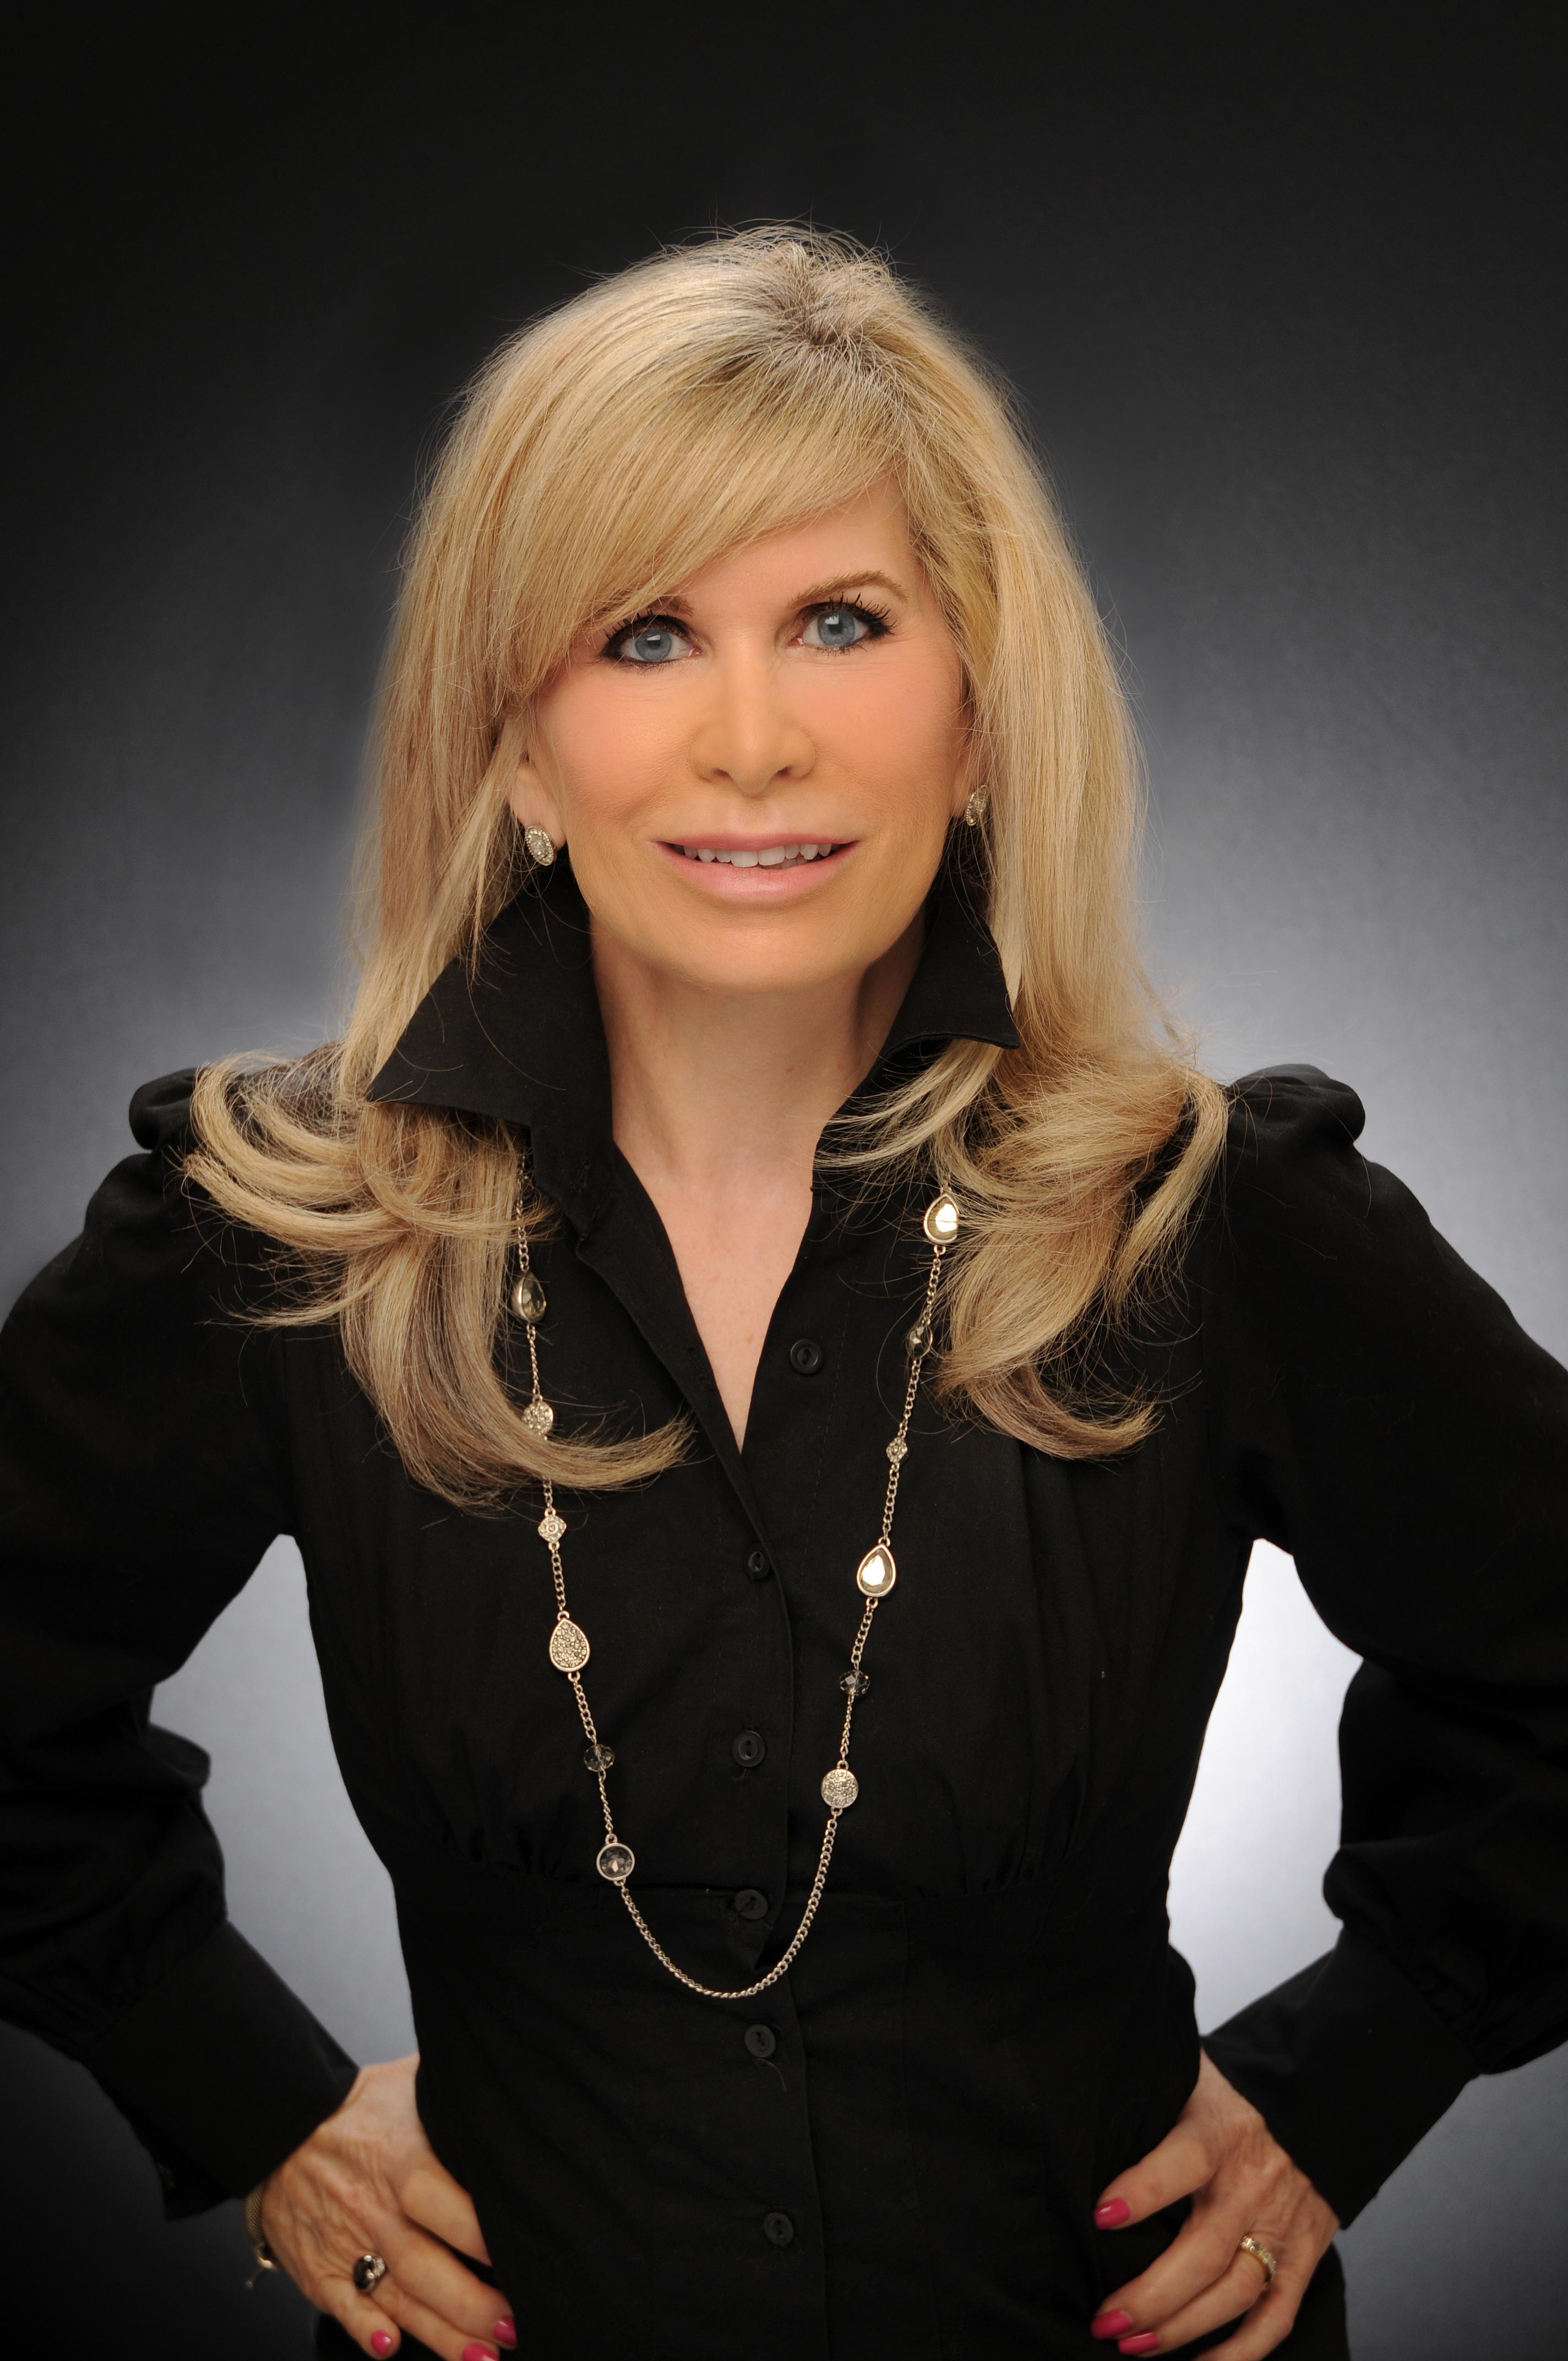 Cathy Paulos